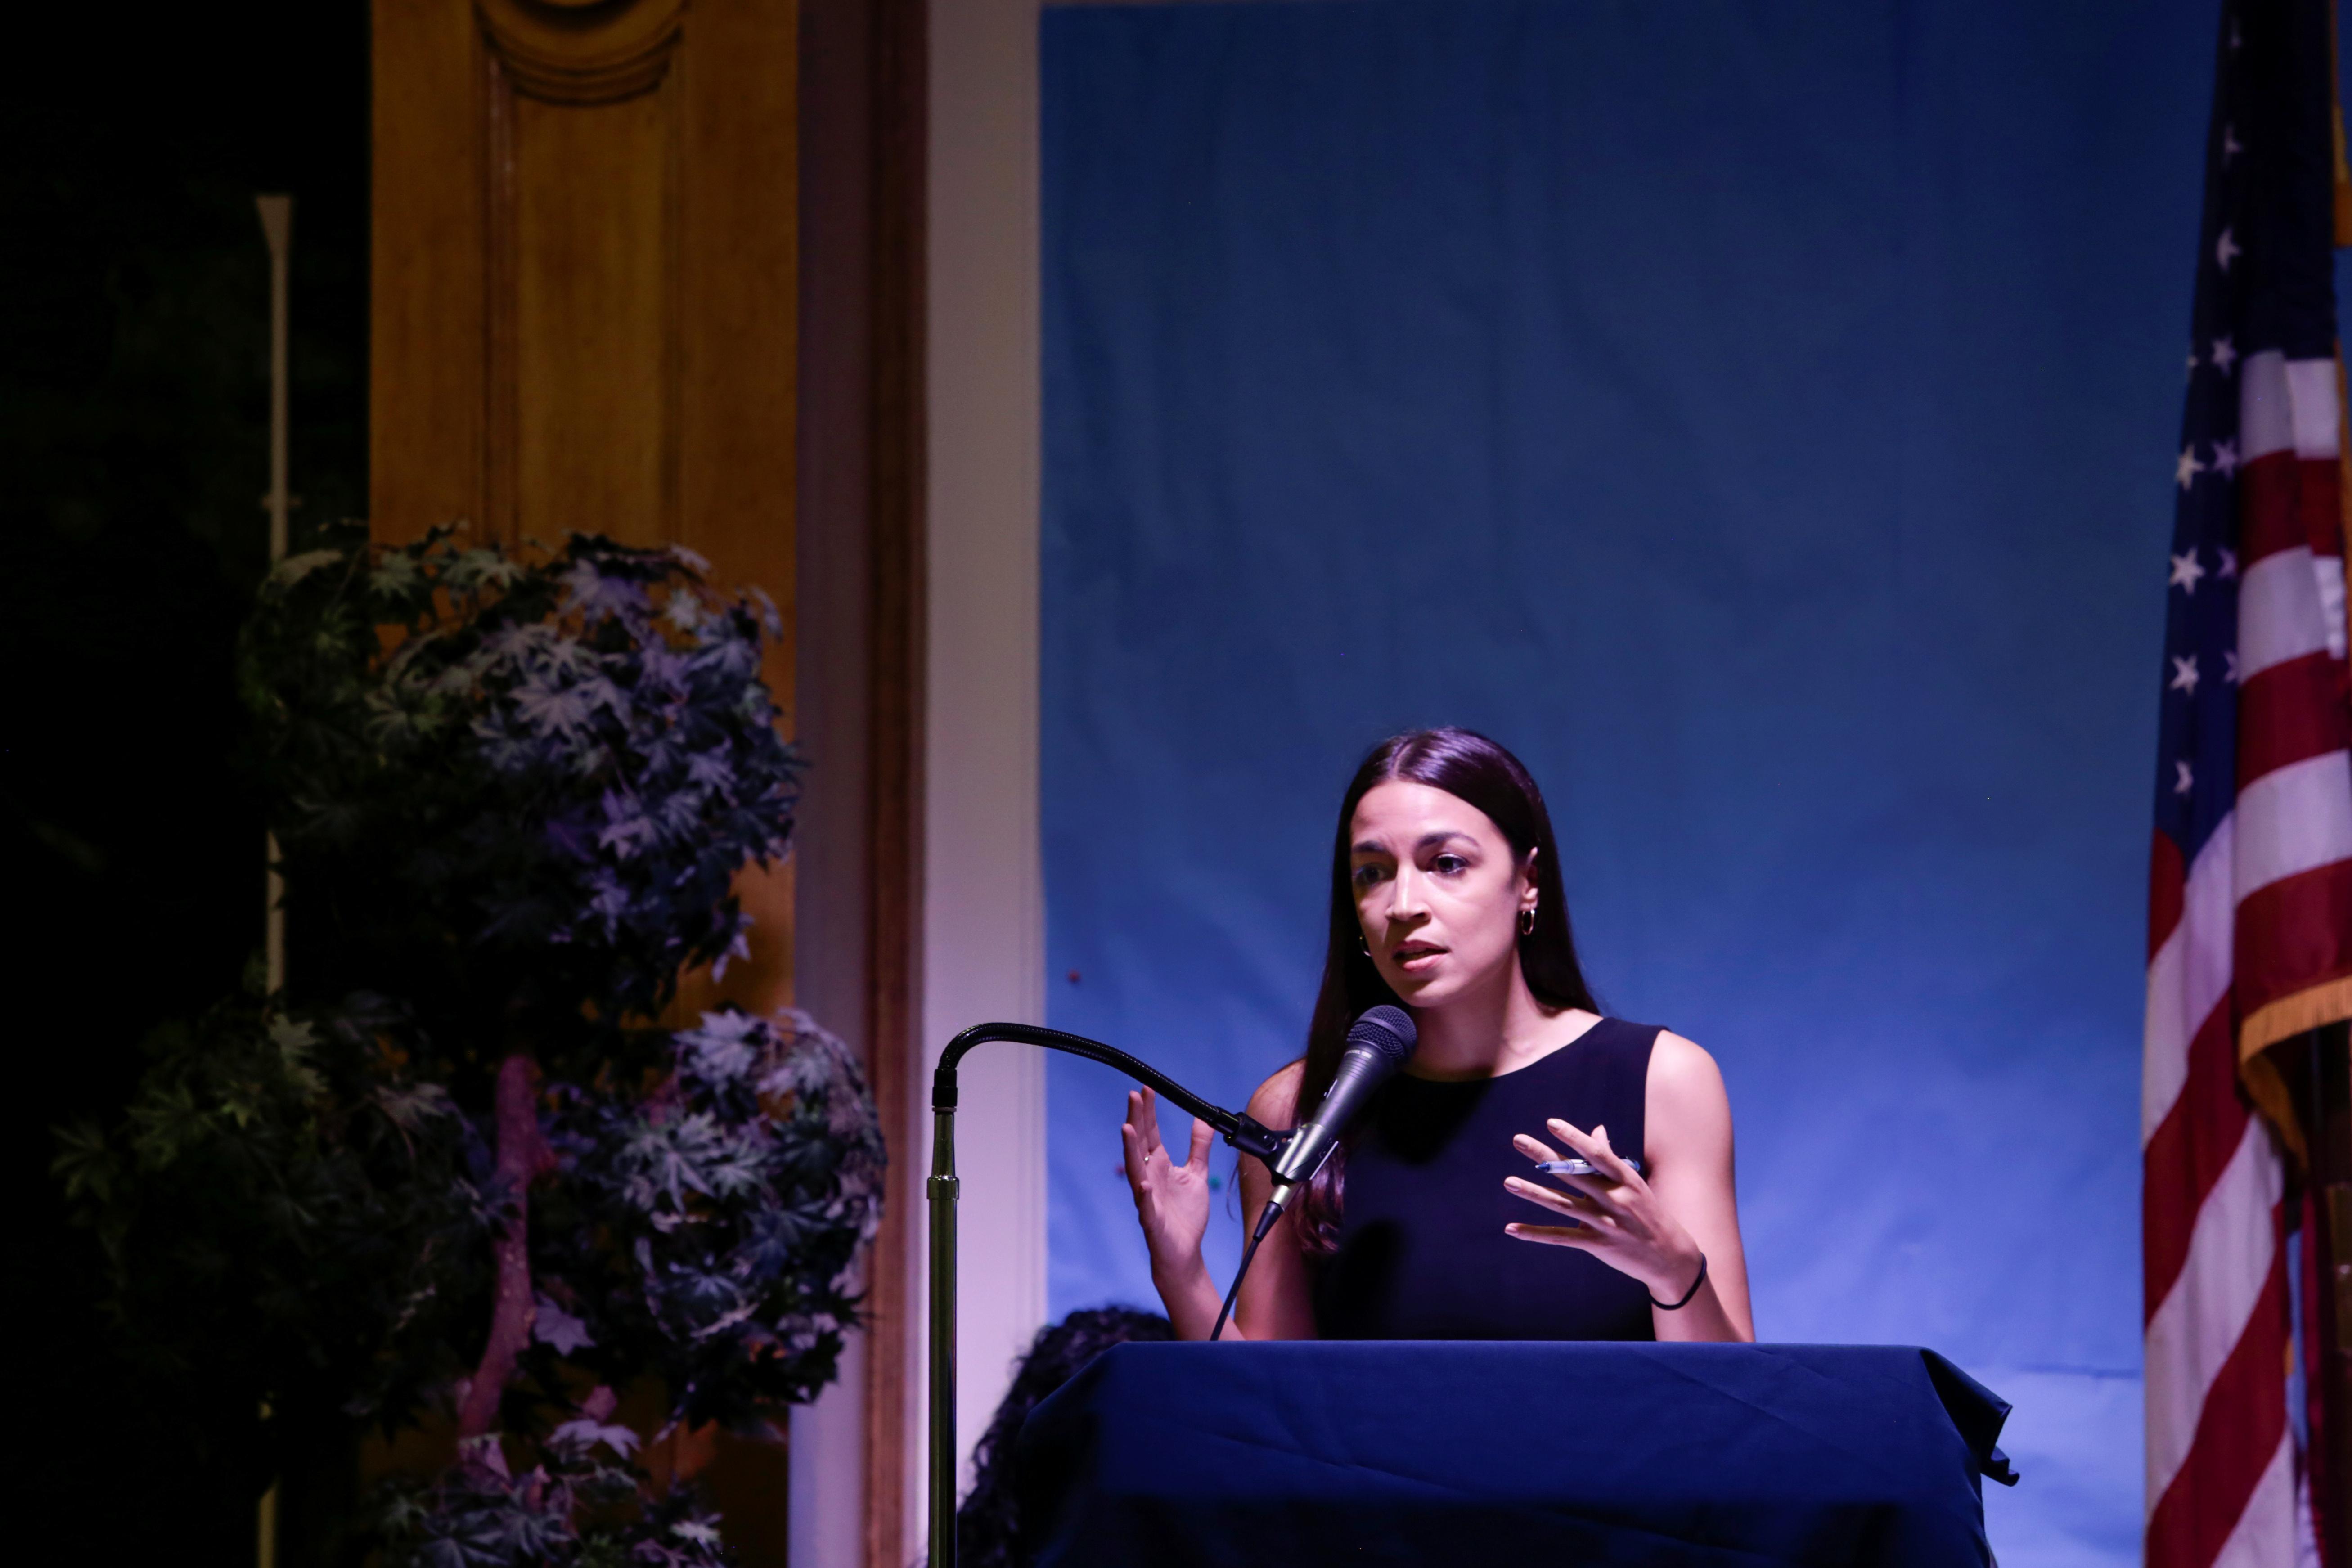 Representative Alexandria Ocasio-Cortez speaks during an Immigration Town Hall at The Nancy DeBenedittis Public School in Queens, New York, U.S. July 20, 2019. REUTERS/Gabriella Angotti-Jones